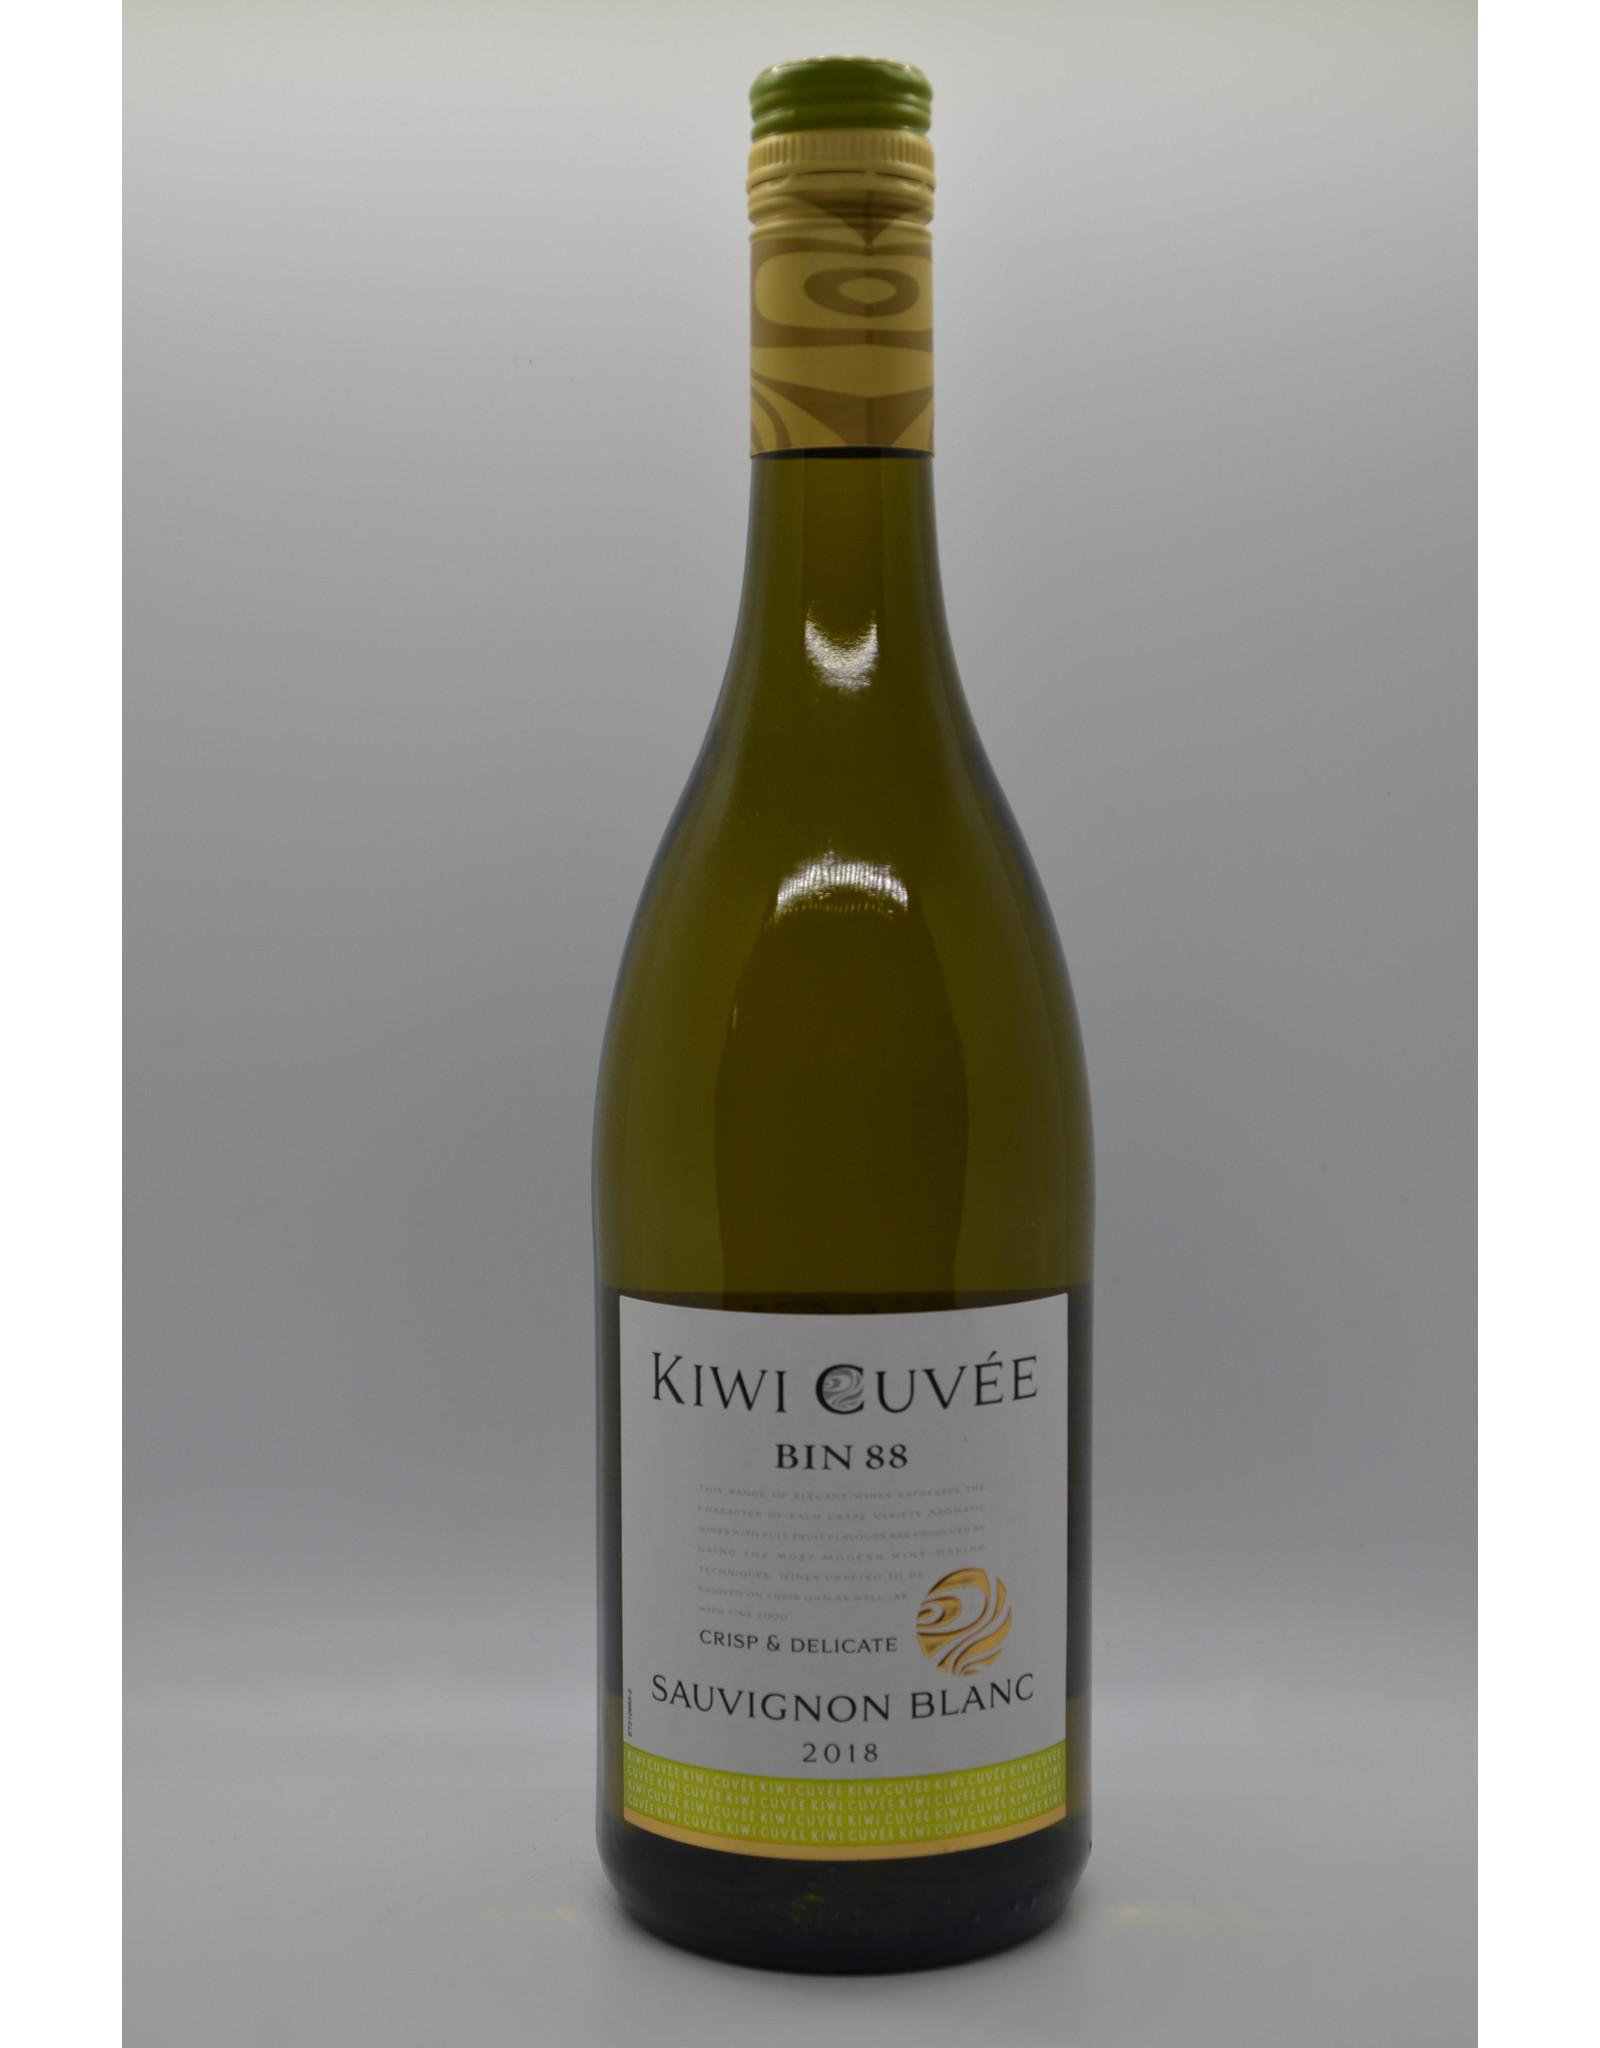 France Kiwi Cuvee Sauvignon Blanc